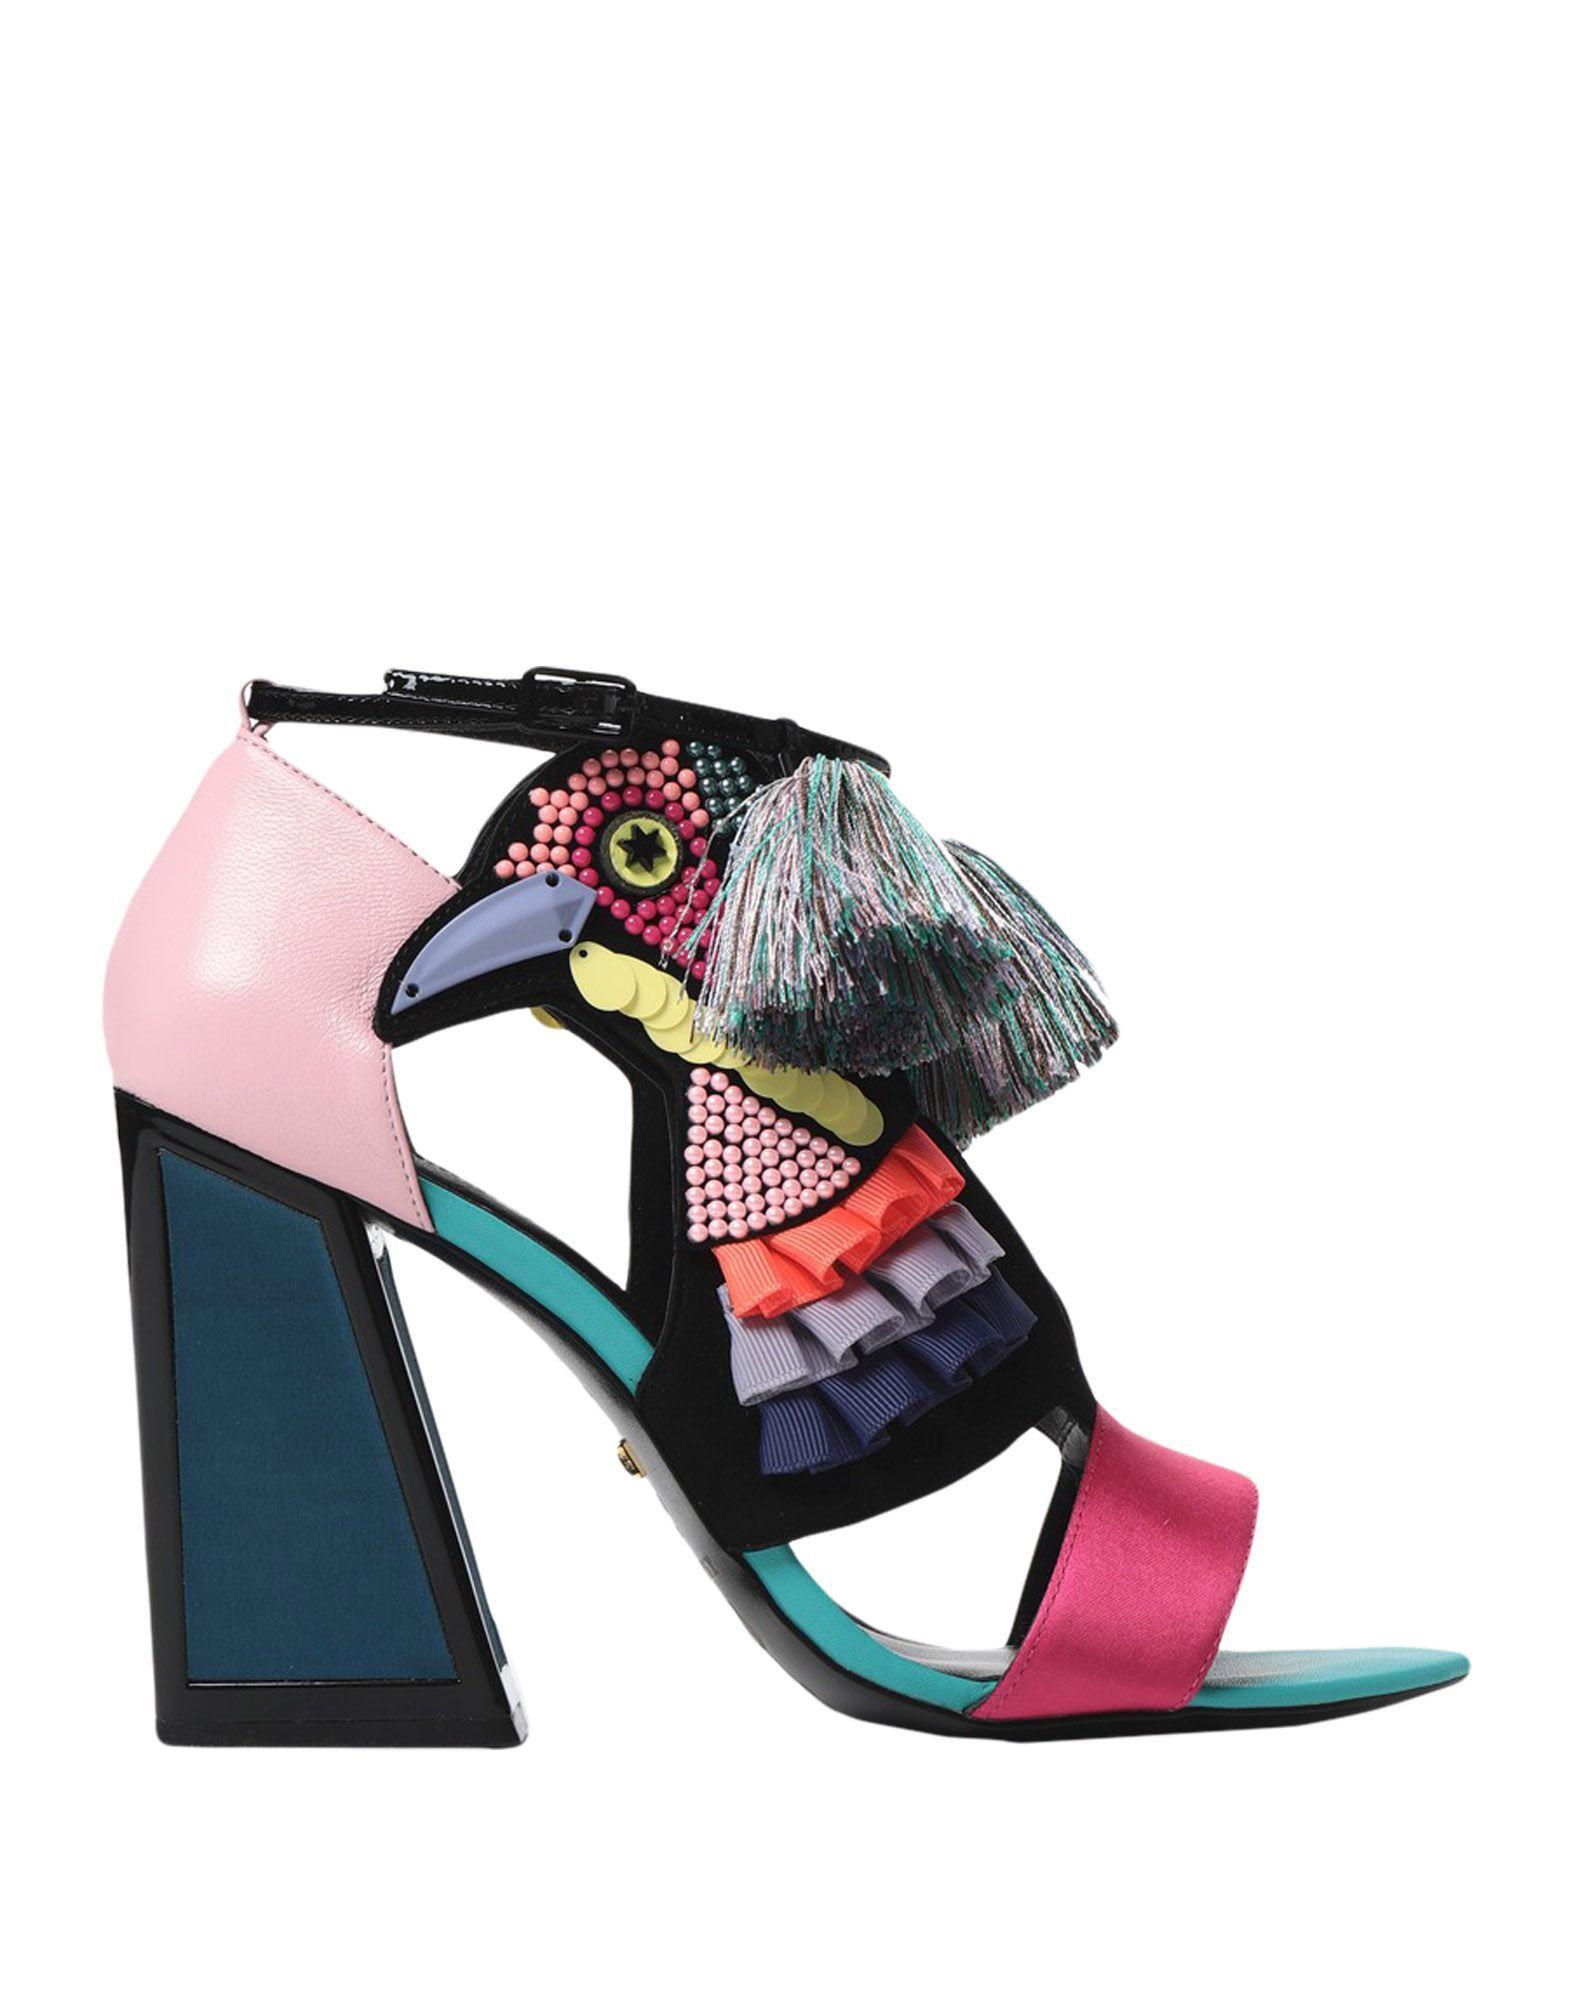 kat maconie aya - sandals - women kat maconie sandals online